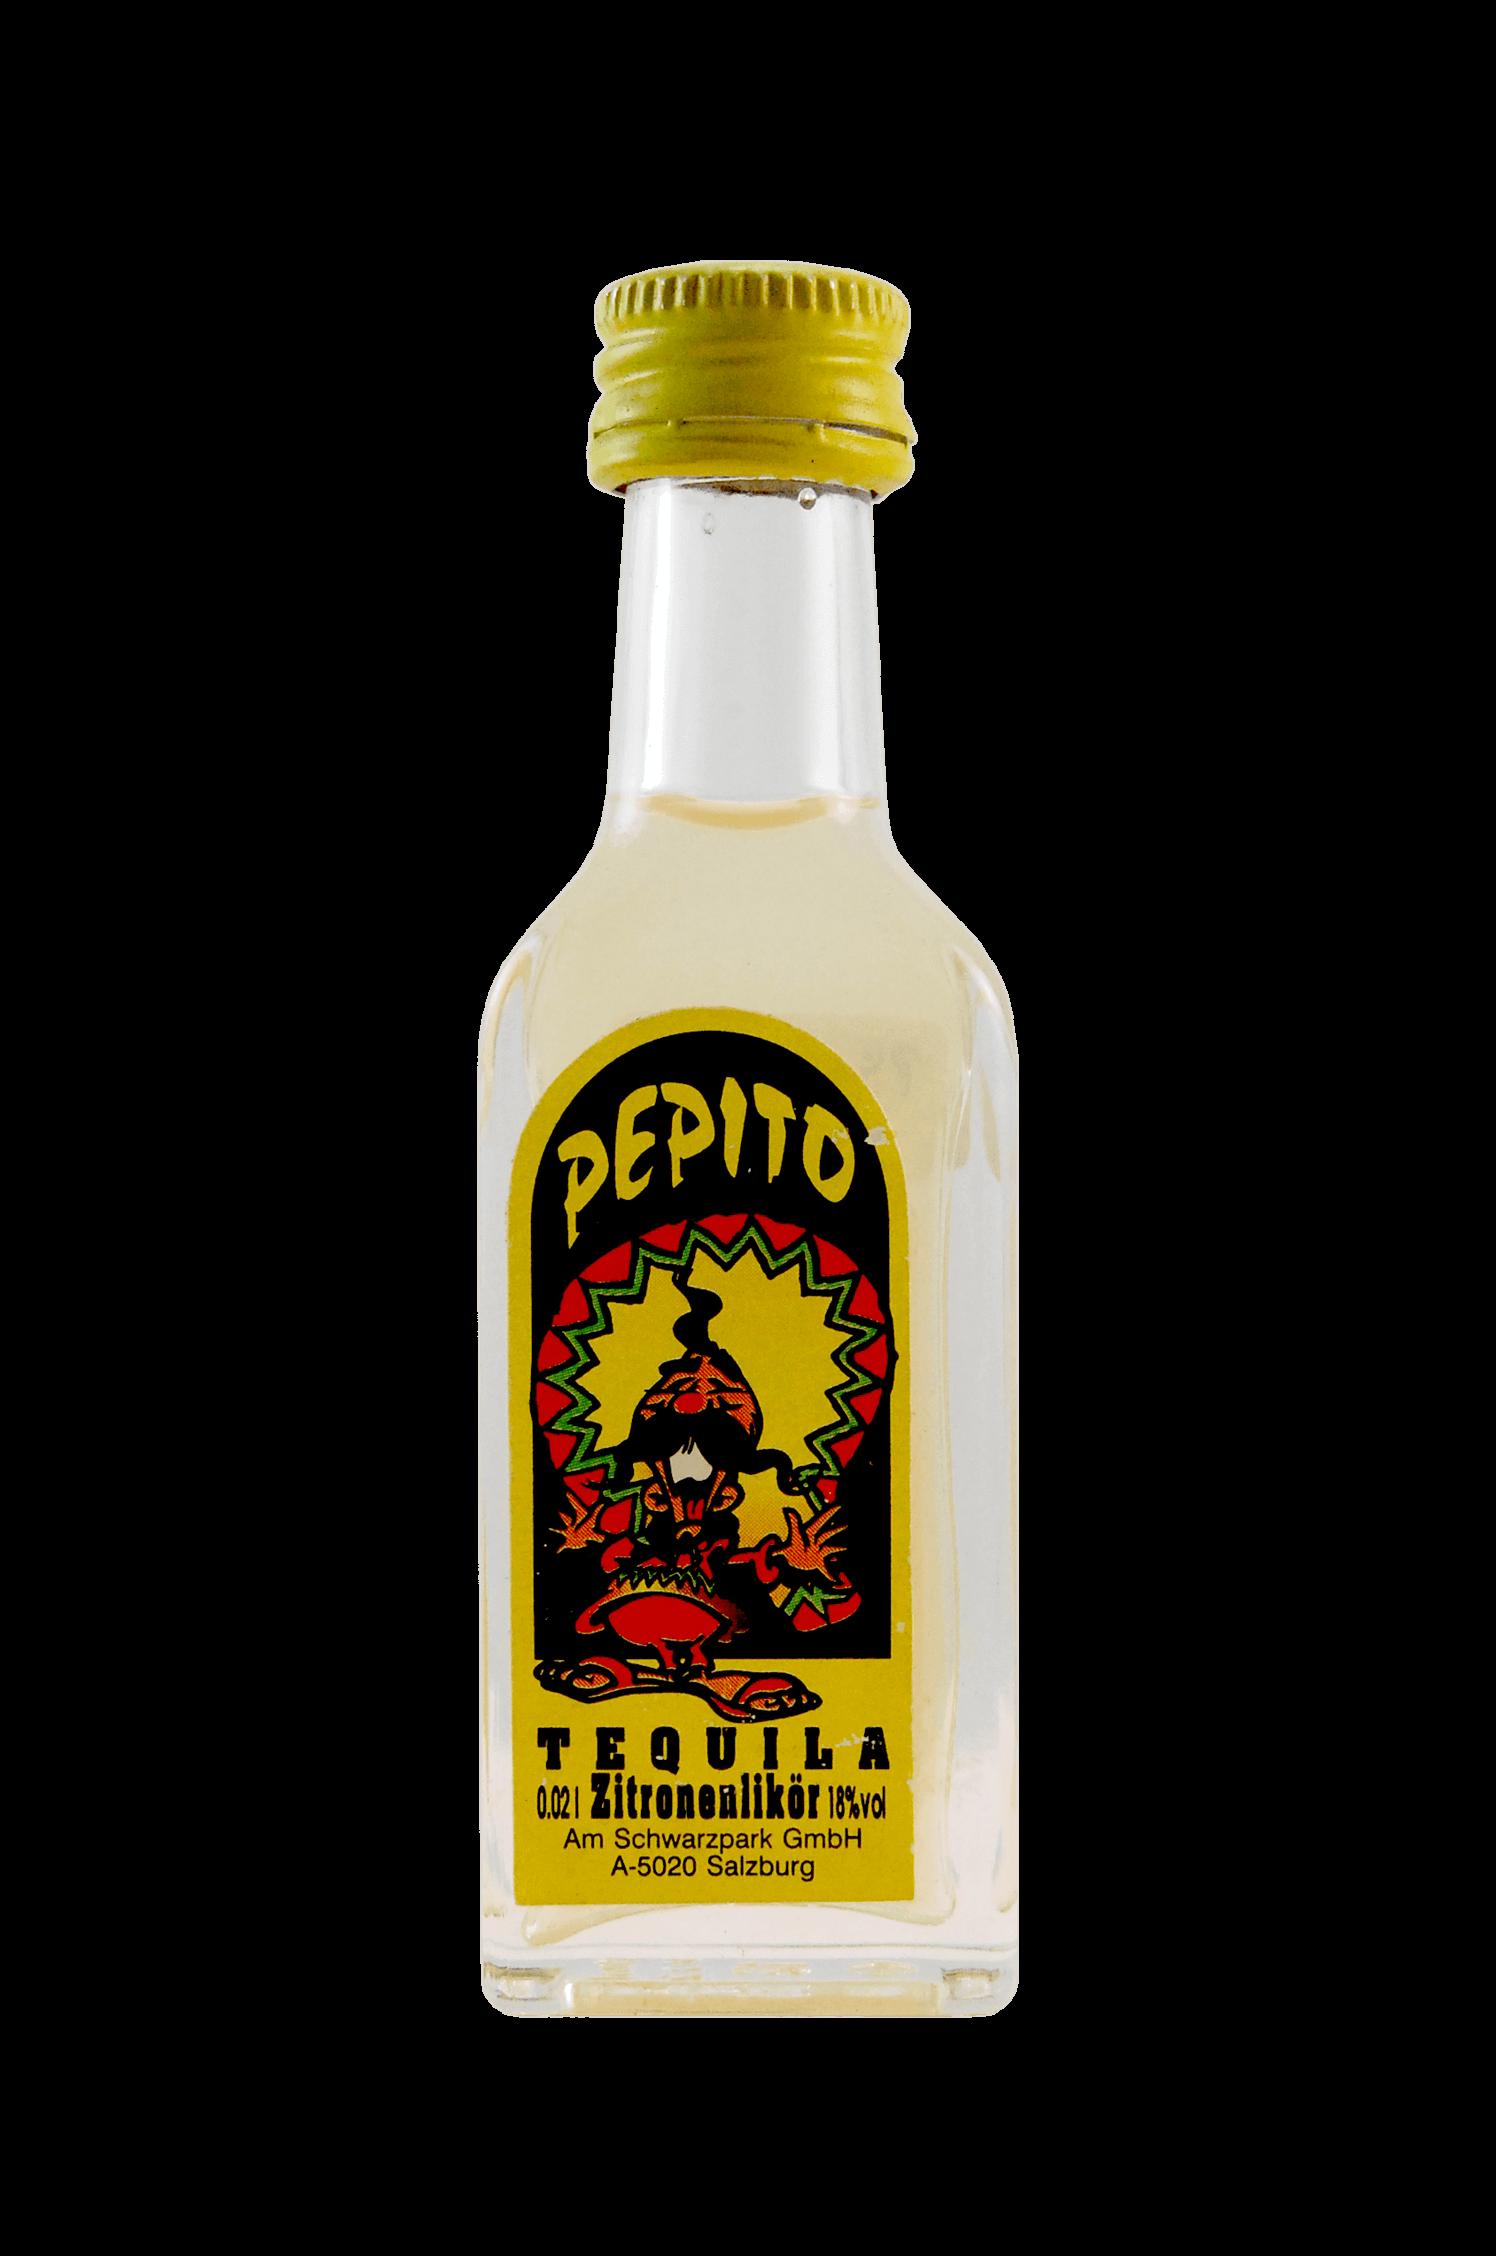 Tequila Pepito